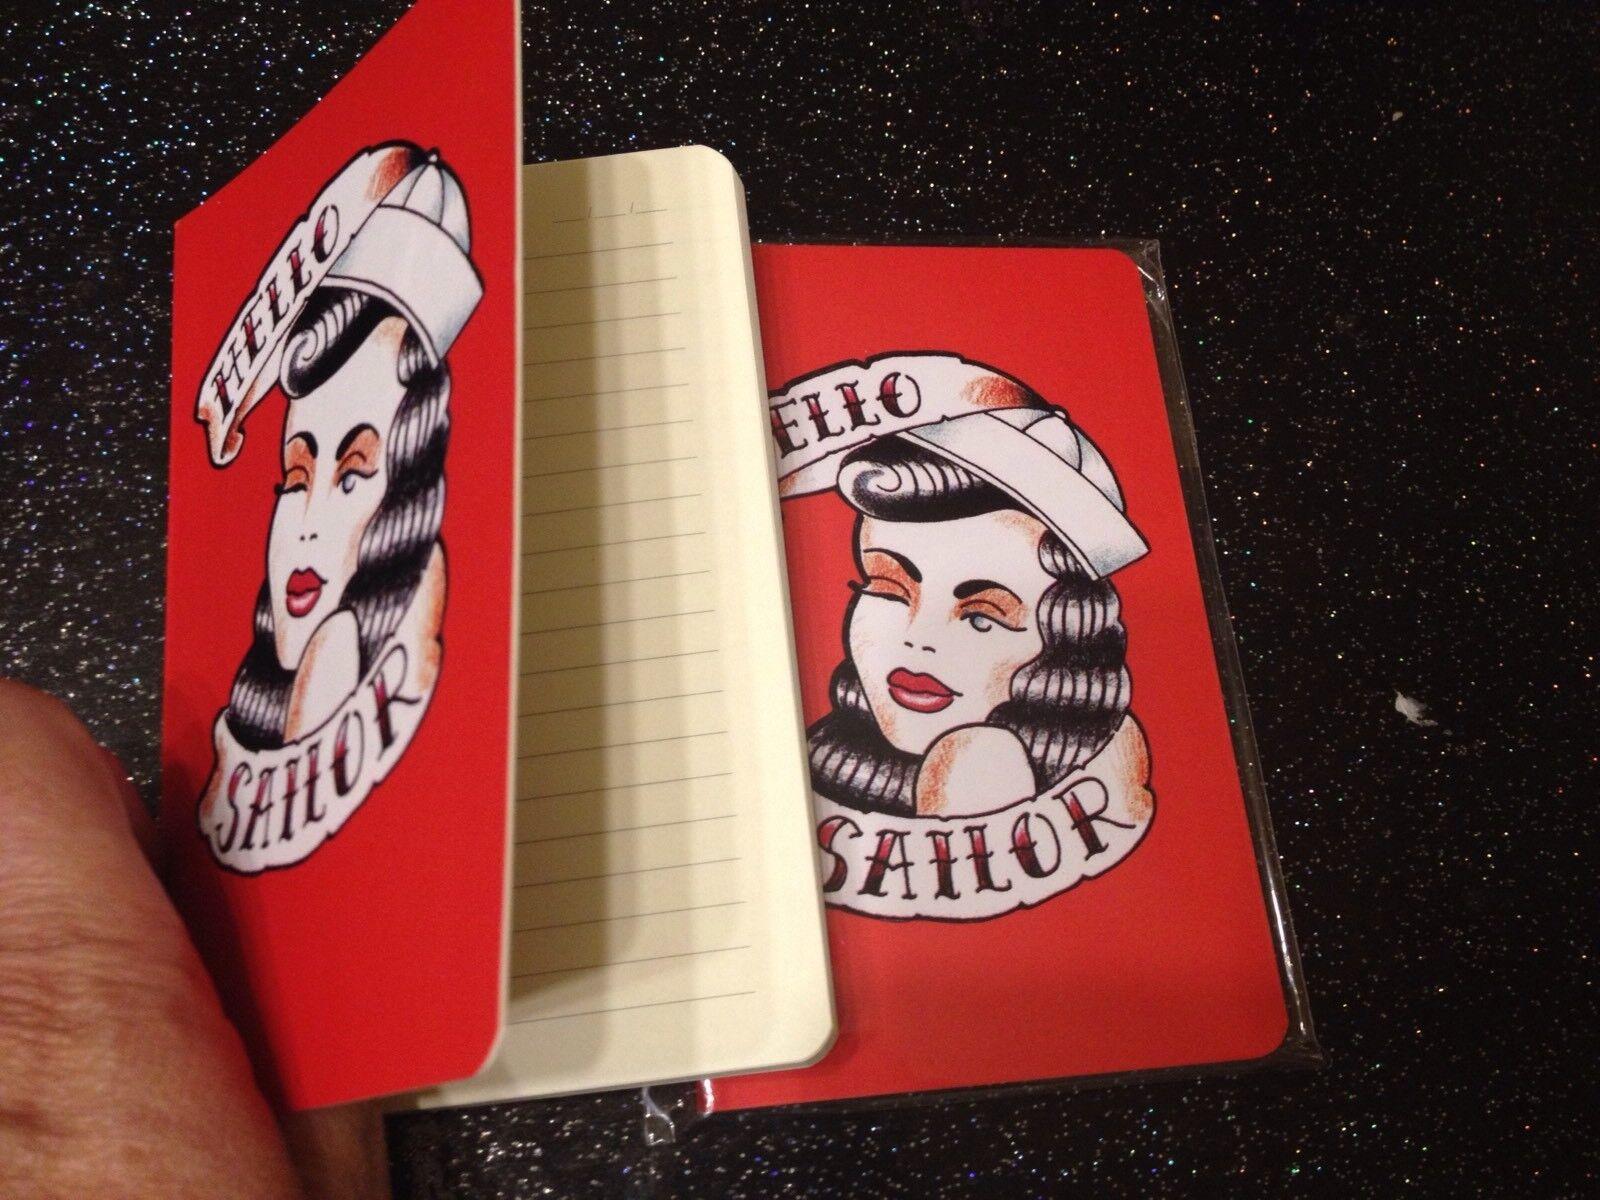 Rockabilly Tattoo 50's Pinup Girl A6 Notebook +Leopard Print Bag 2pc Gift Set